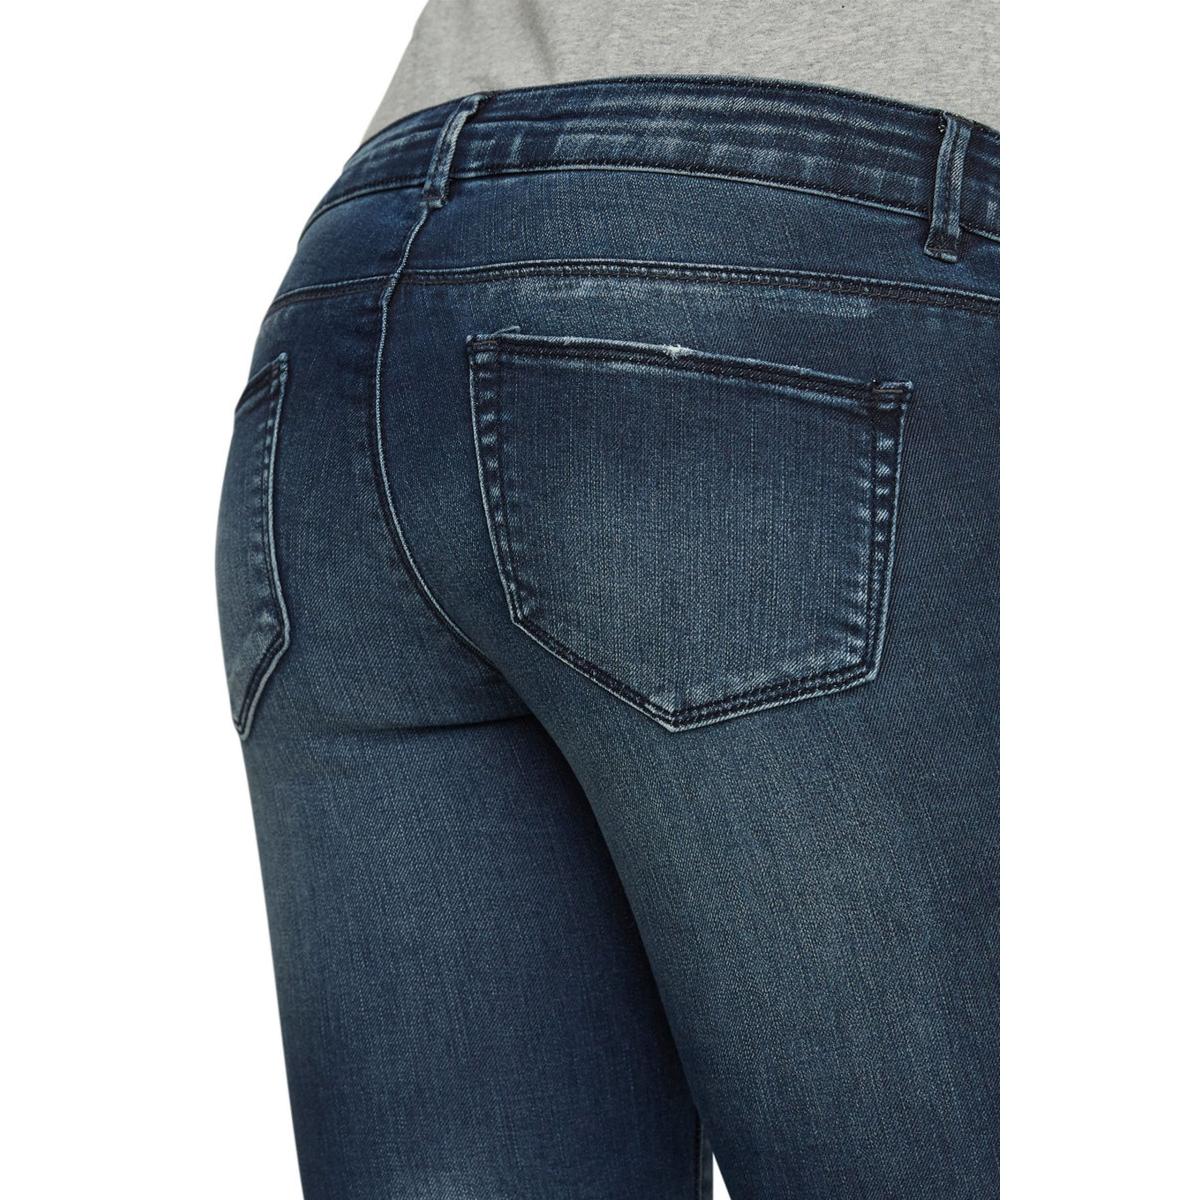 mlmyra slim blue jeans s-noos 20007784 mama-licious positie broek dark blue denim